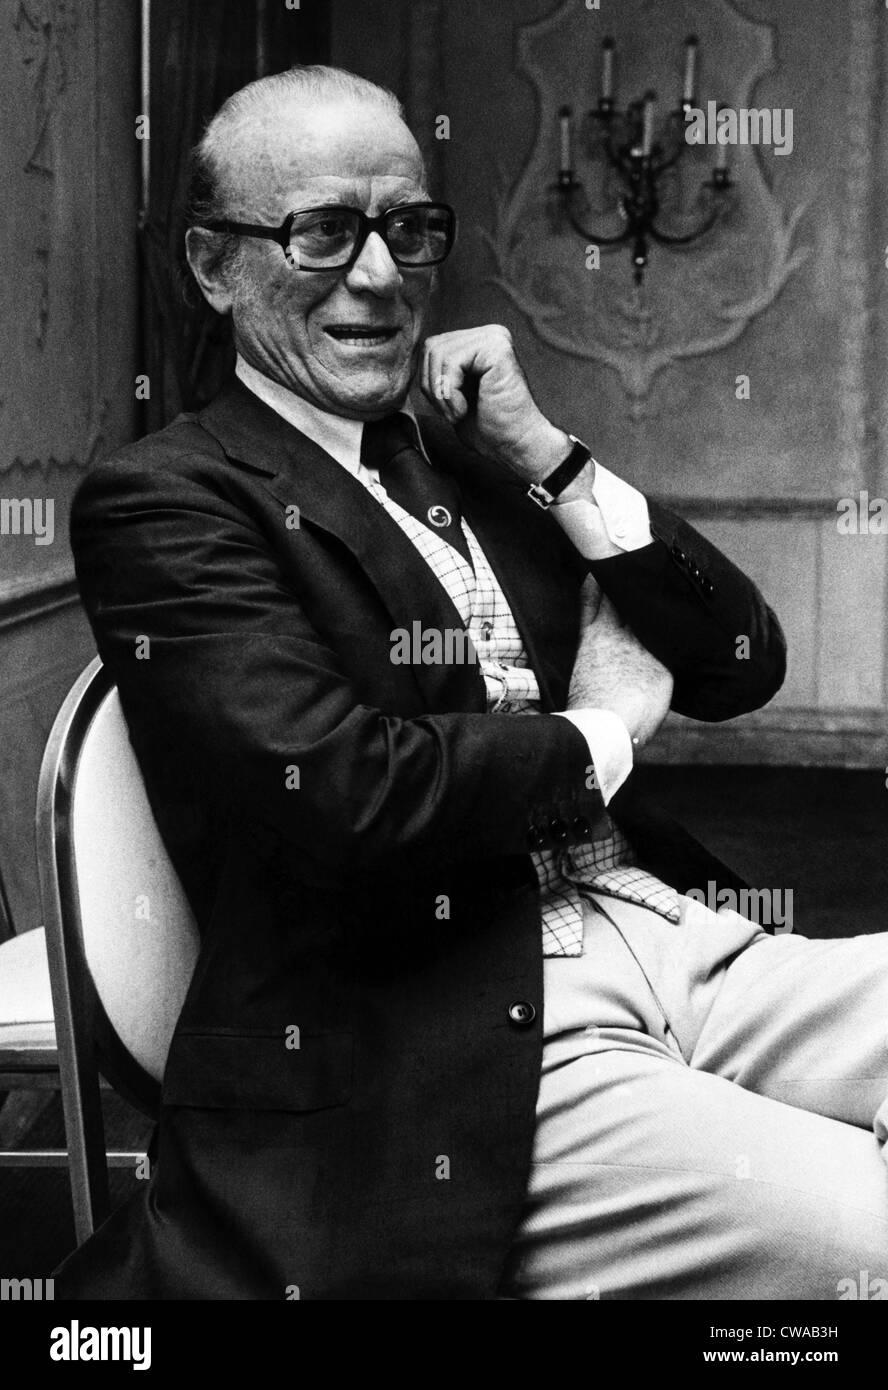 Aldo Gucci. ca. fin des années 1970. Avec la permission de: Archives CSU/Everett Collection. Photo Stock